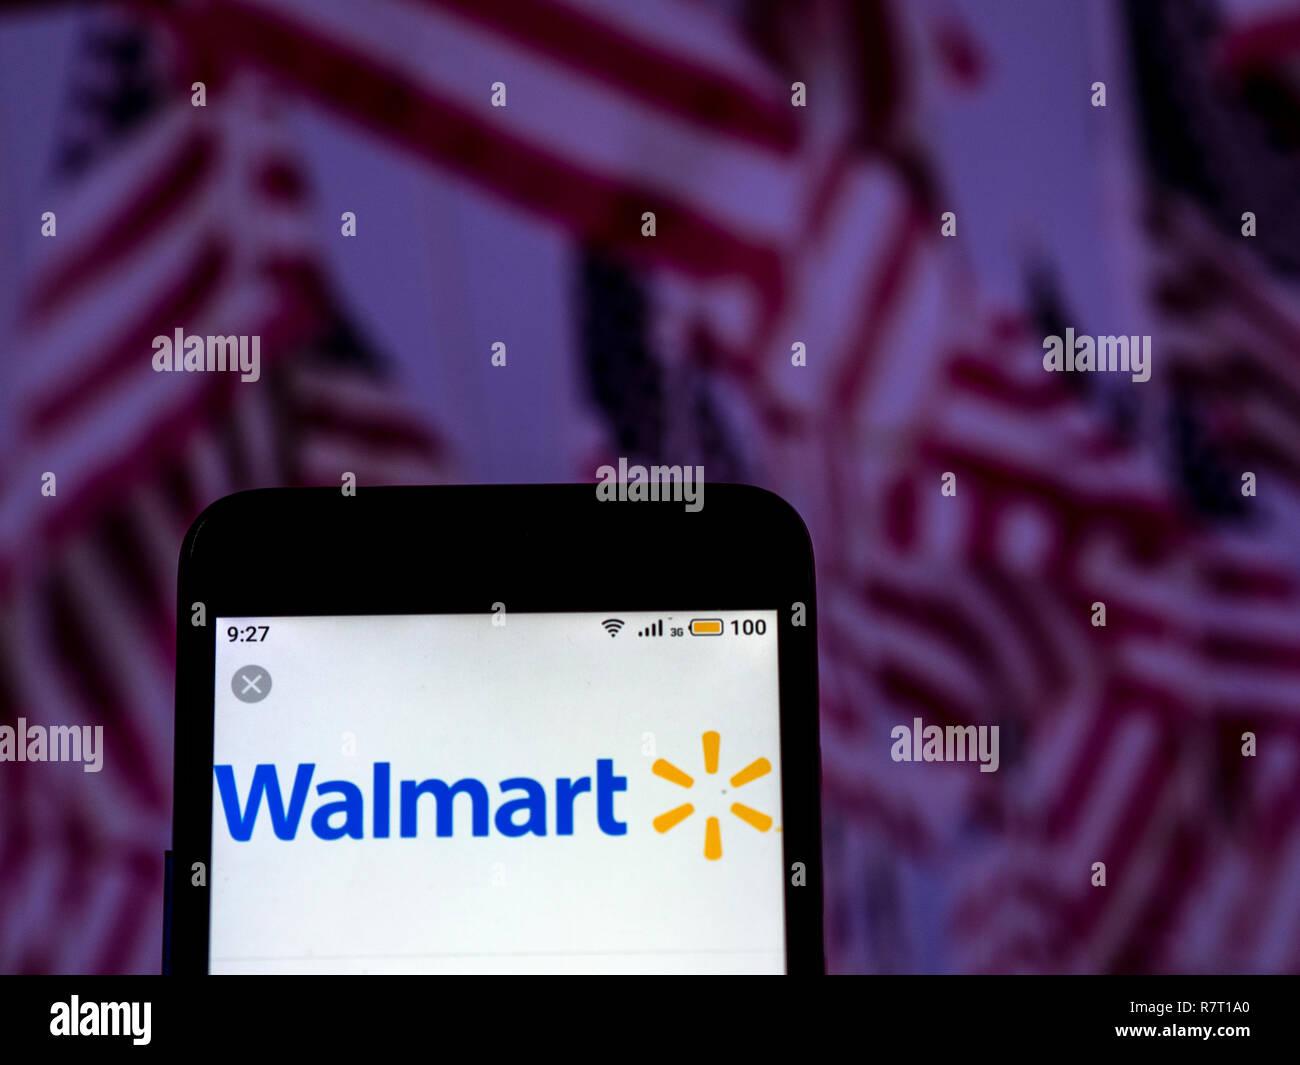 Walmart Stock Phone Number >> Walmart Logo Seen Displayed On Smart Phone Stock Photo 228565288